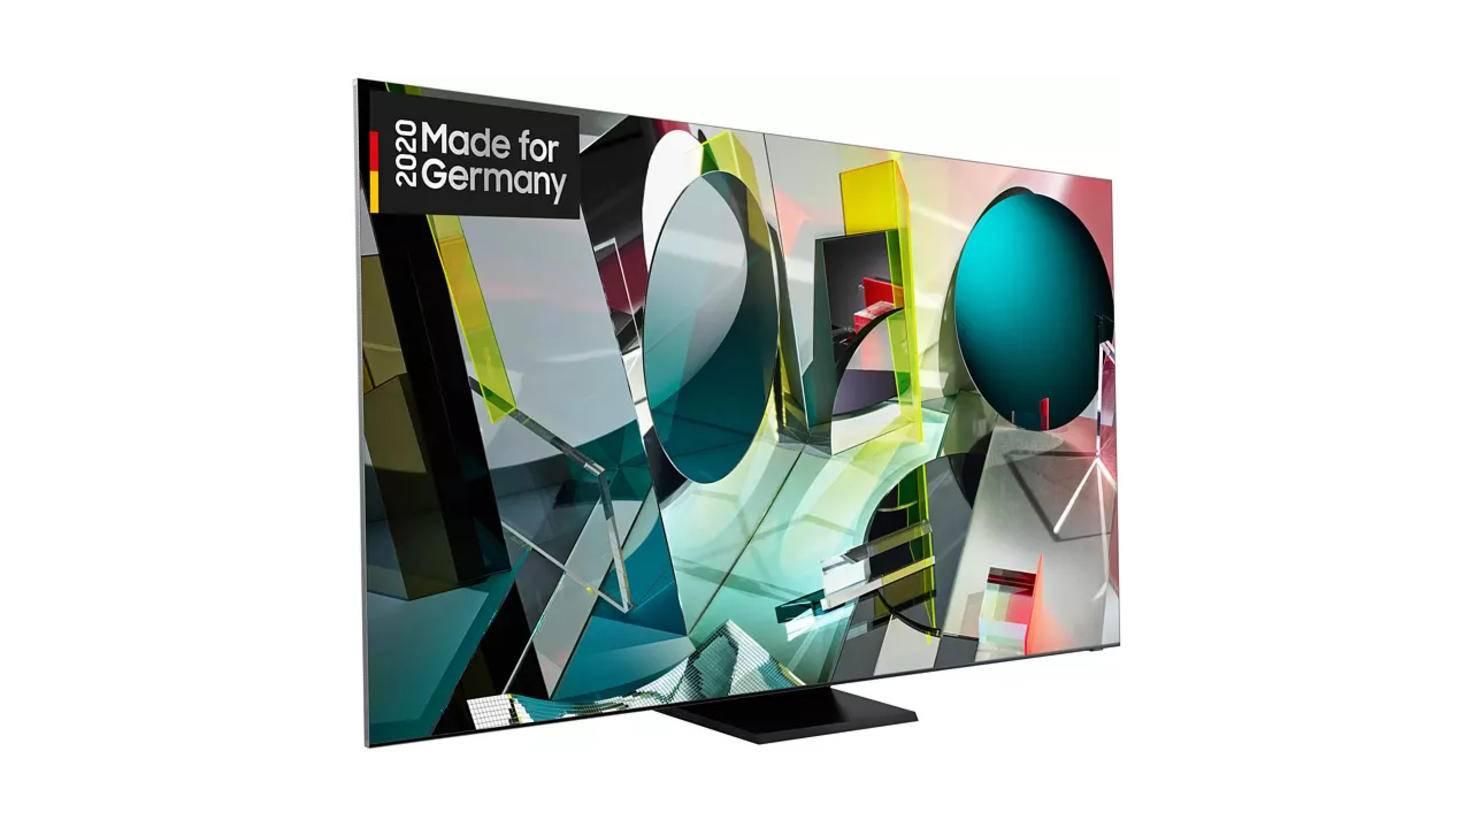 Samsung GQ75Q950T 8K TV 75 inches